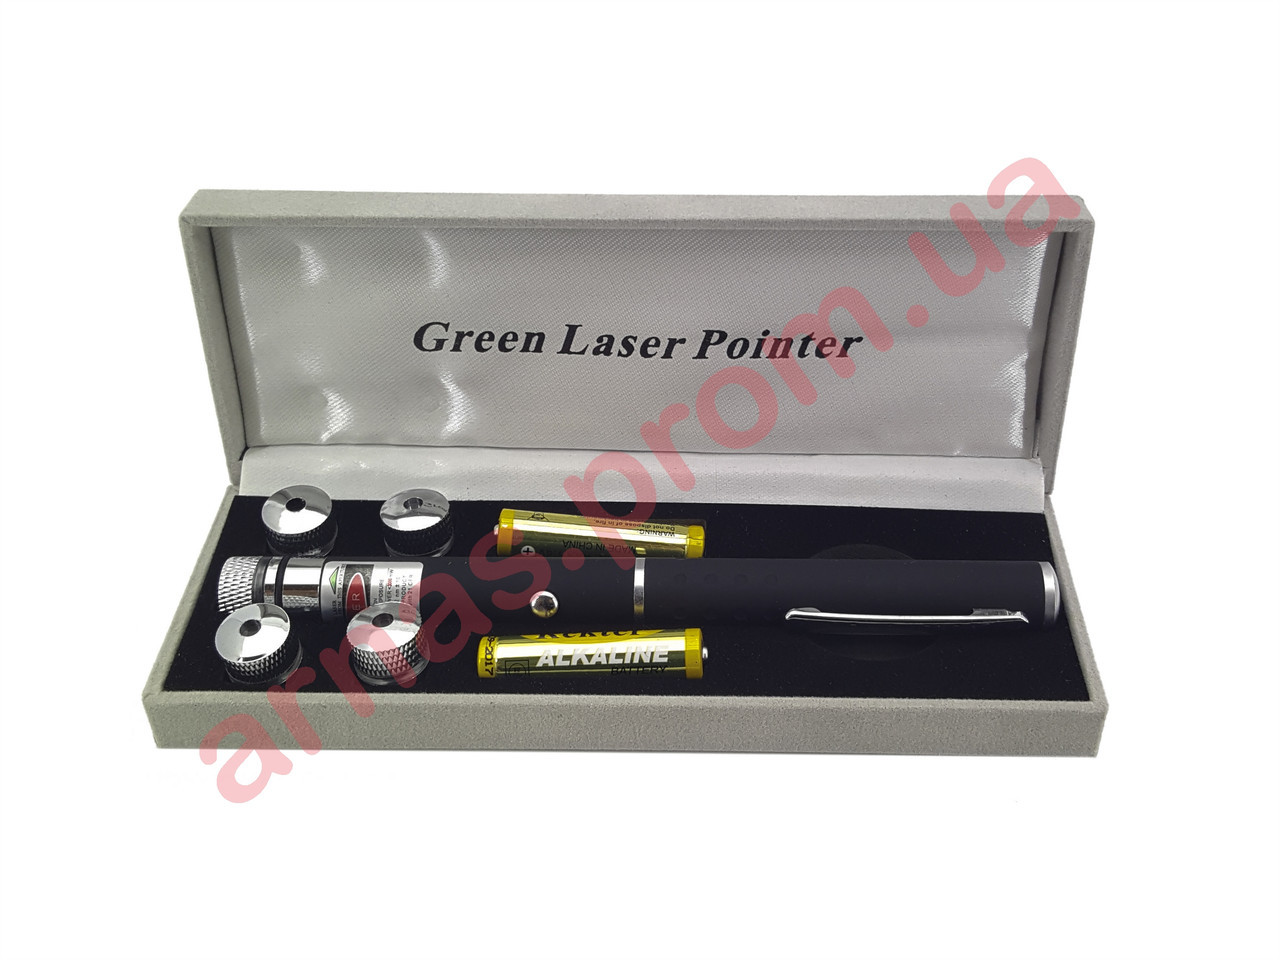 Лазерная указка Green Laser Pointer, зеленый лазер, 5 насадок